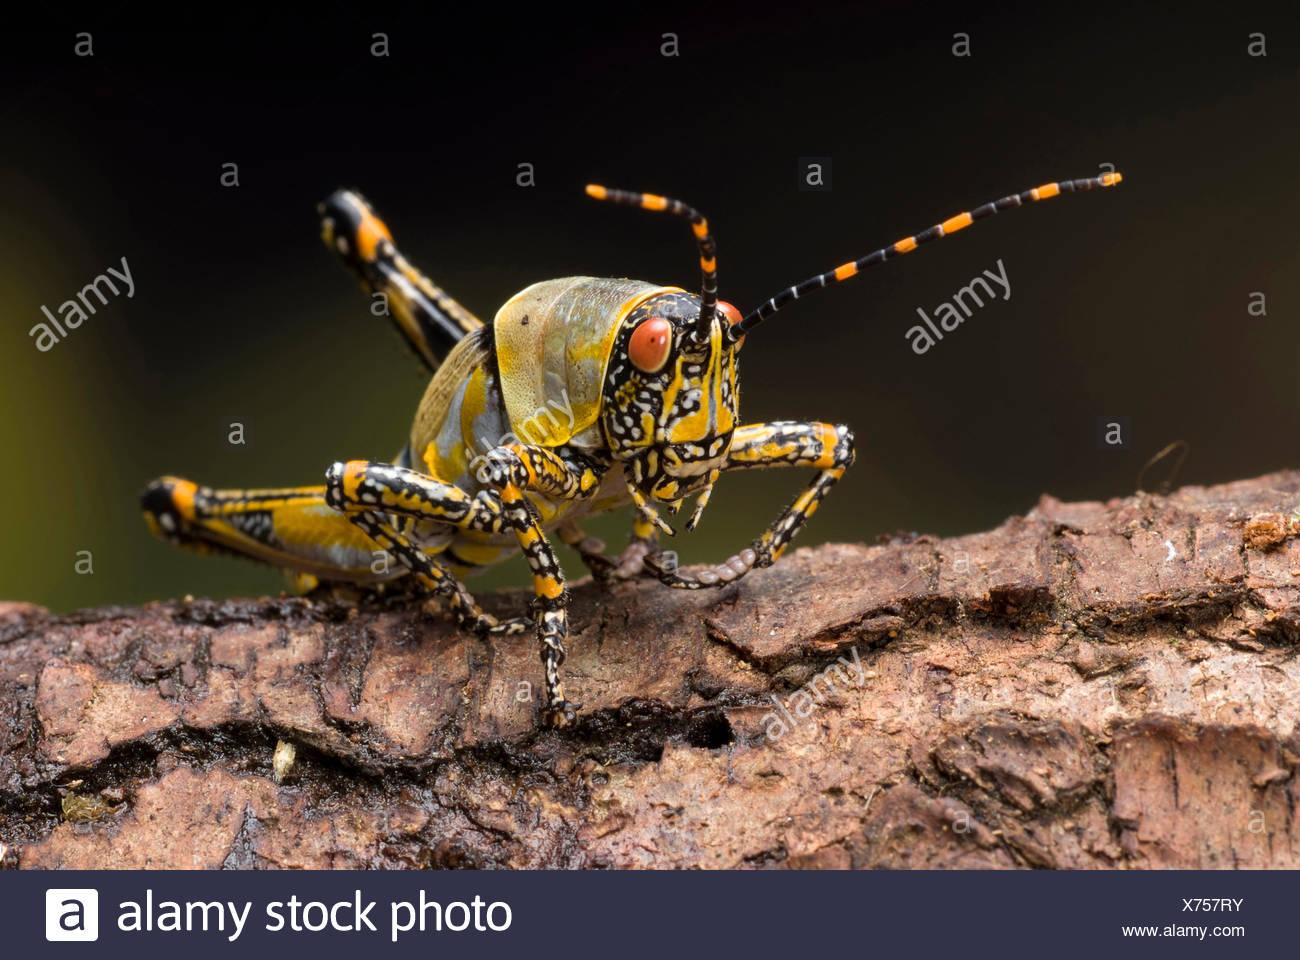 Elegant grashopper (Zonocerus elegans), portrait - Stock Image